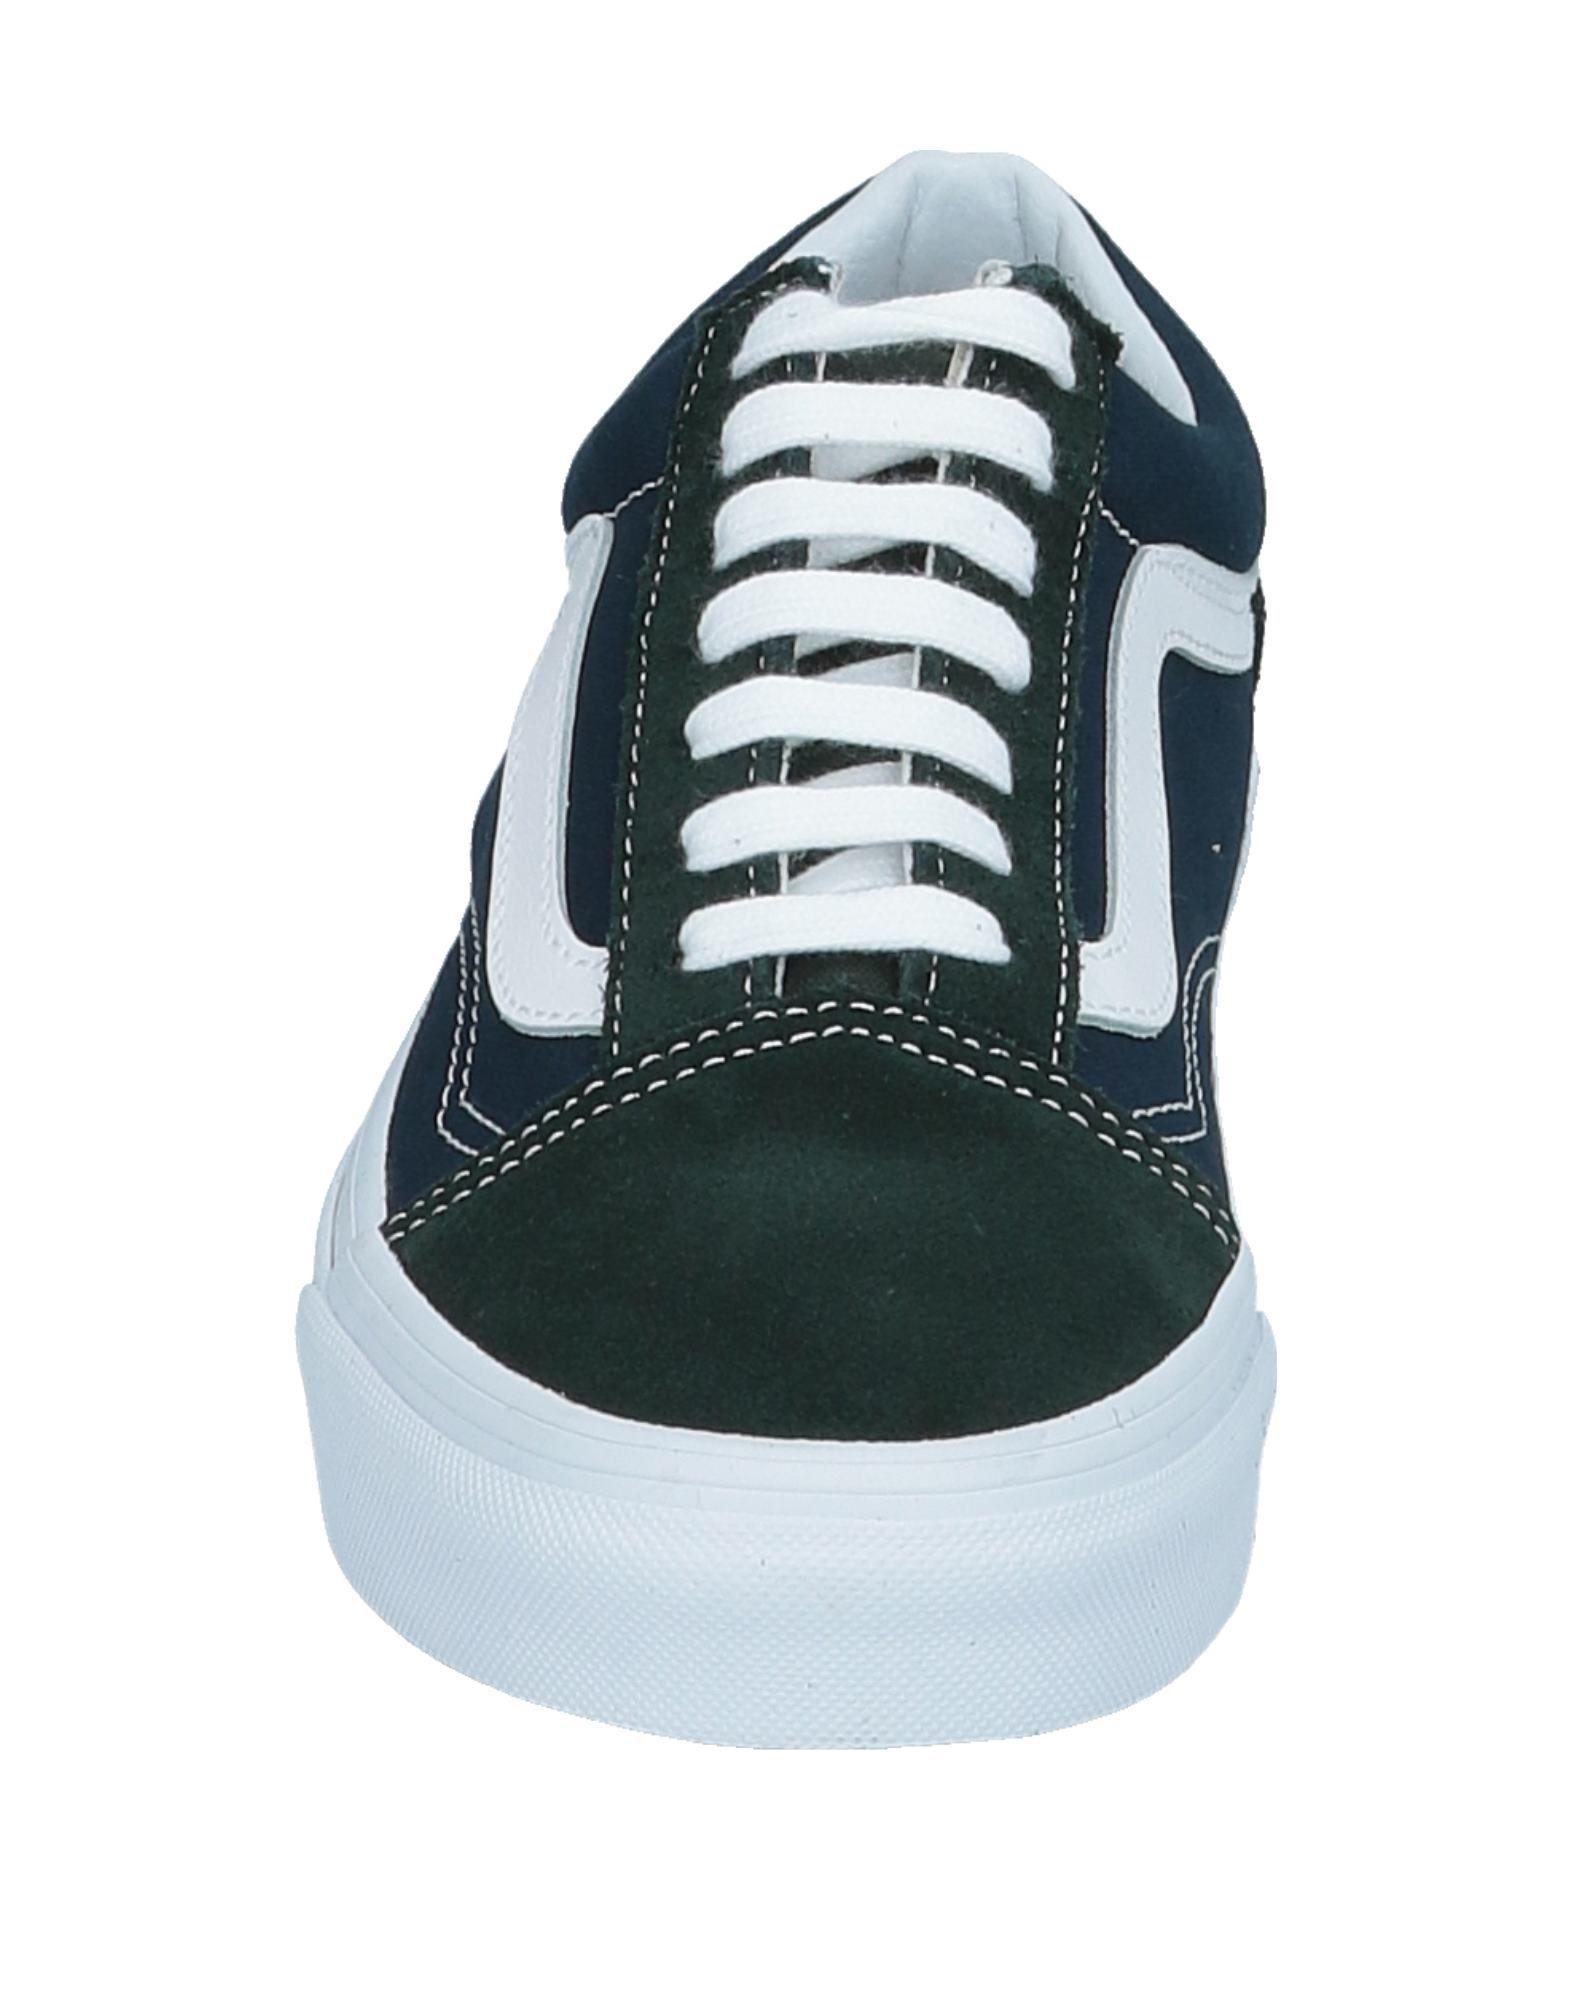 Vans Sneakers Damen beliebte  11508694BF Gute Qualität beliebte Damen Schuhe f8fa8c